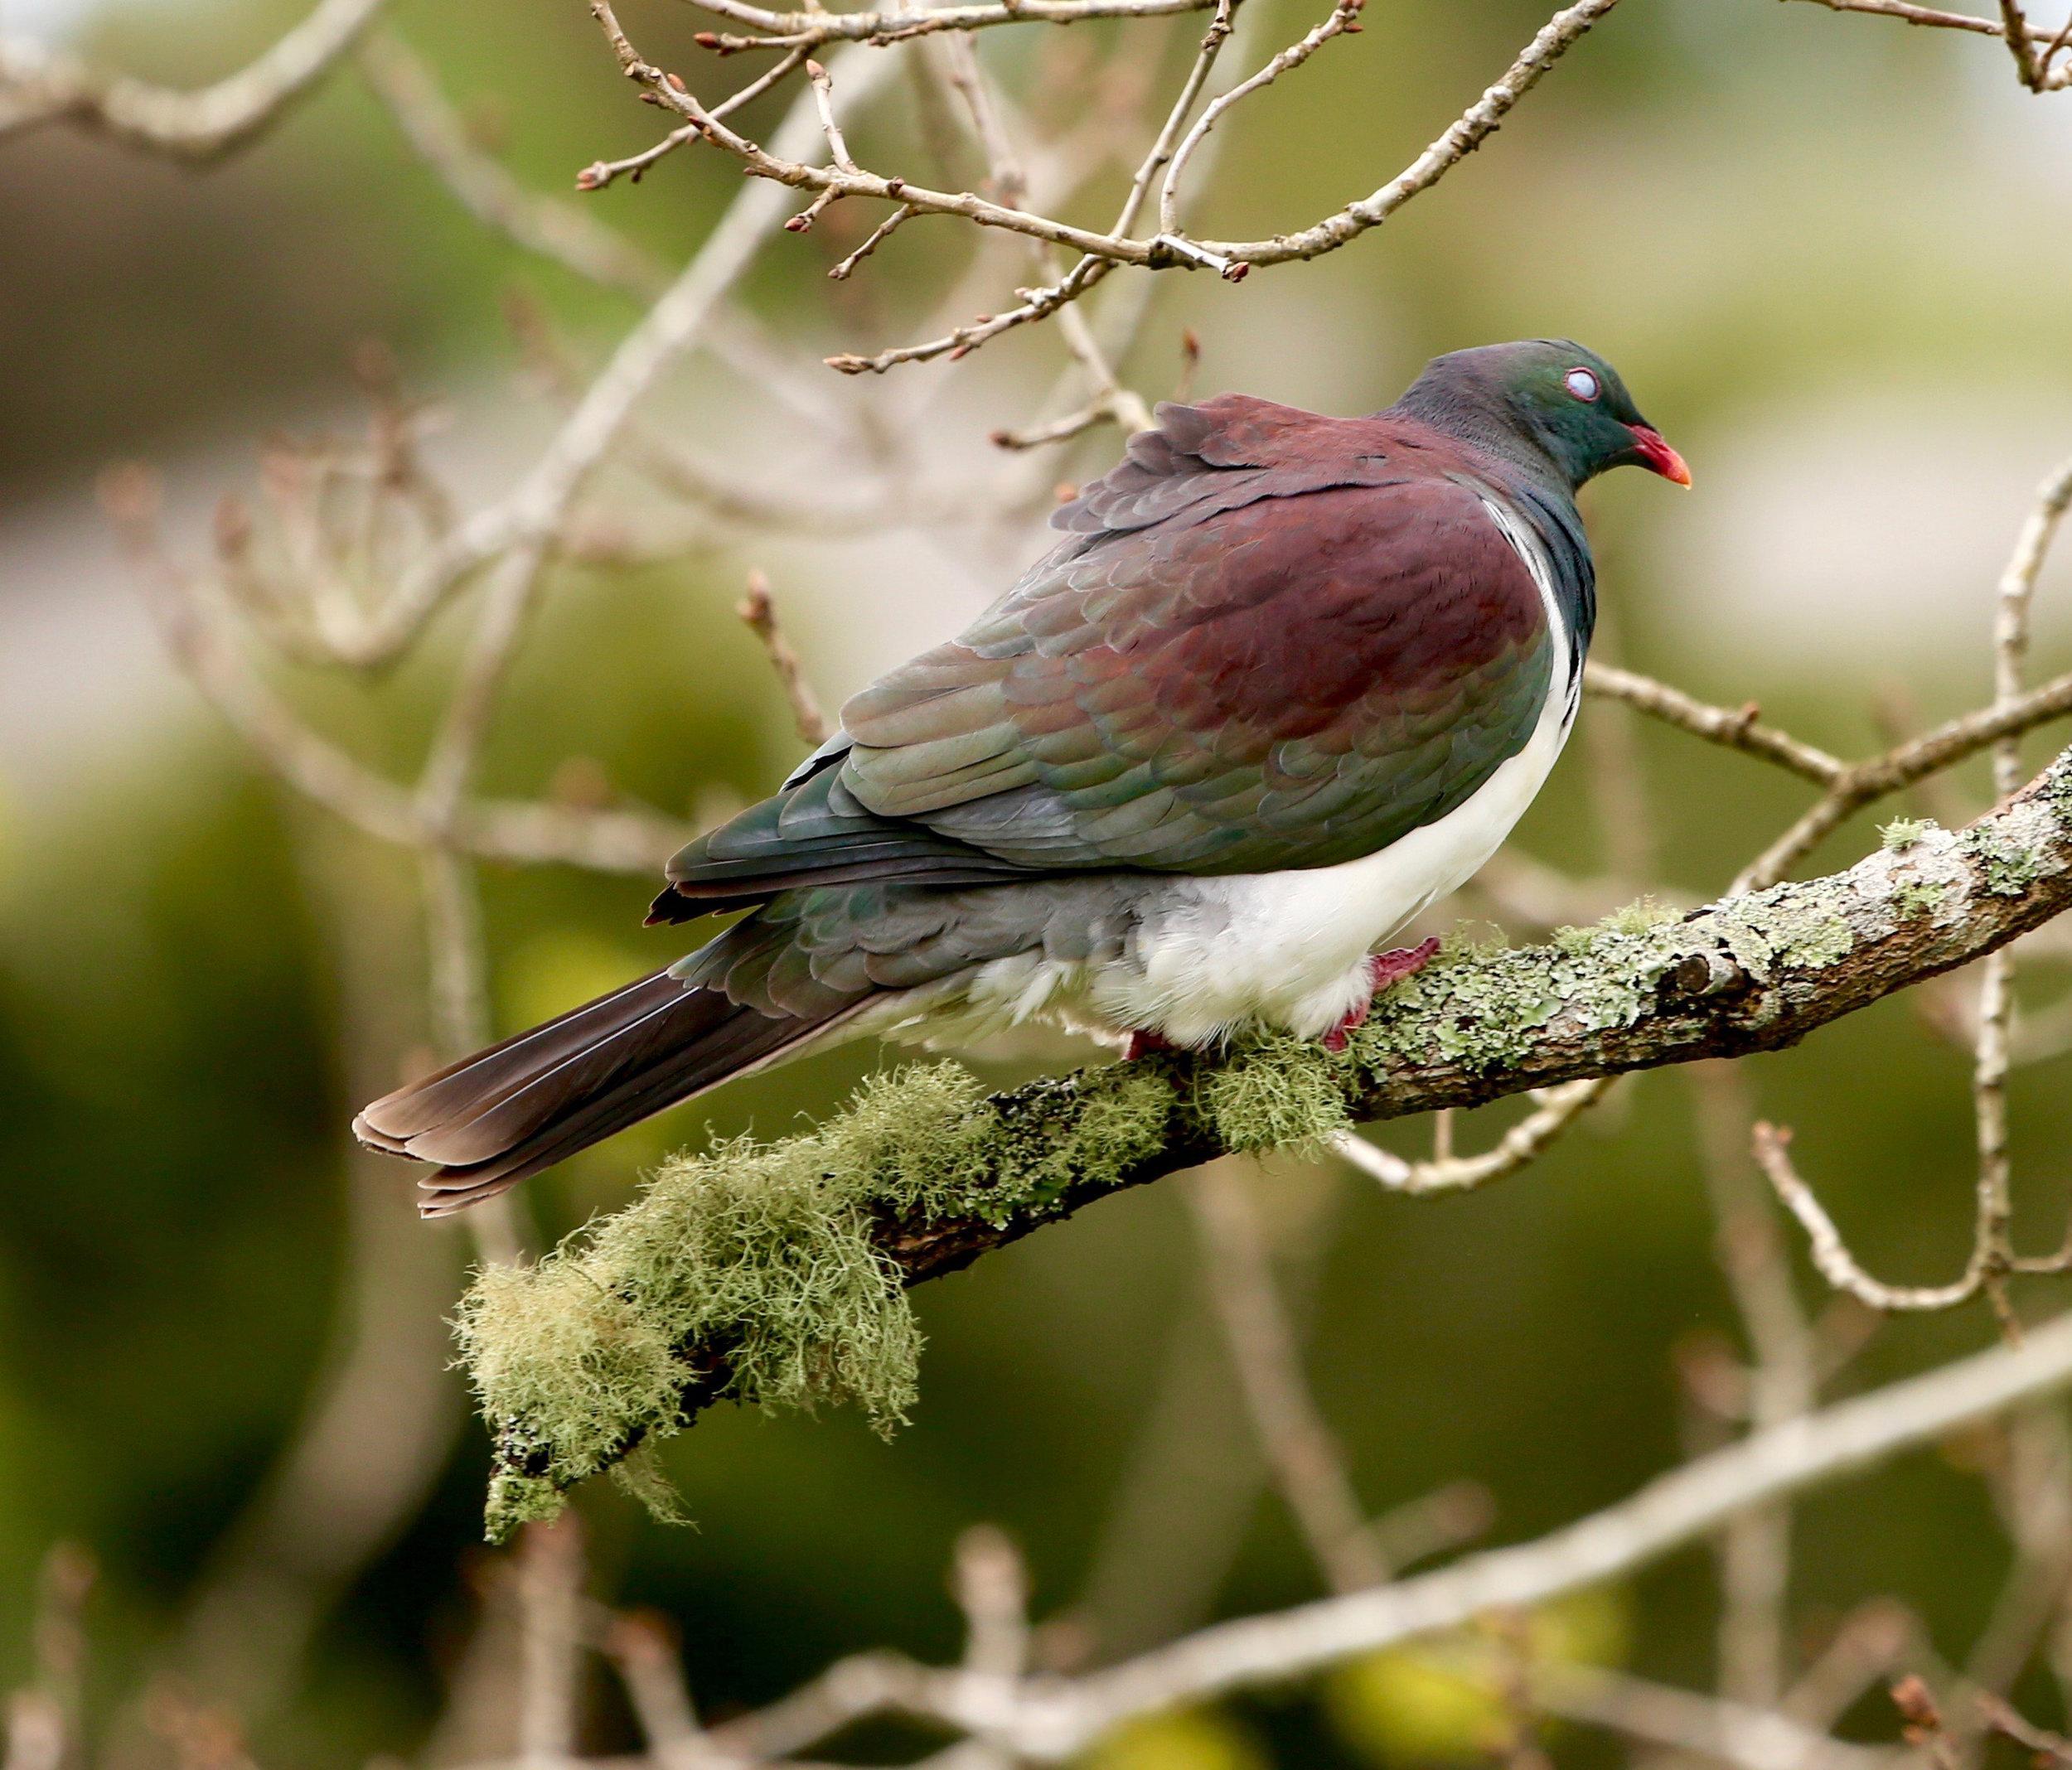 wood-pigeon-on-branch.jpg